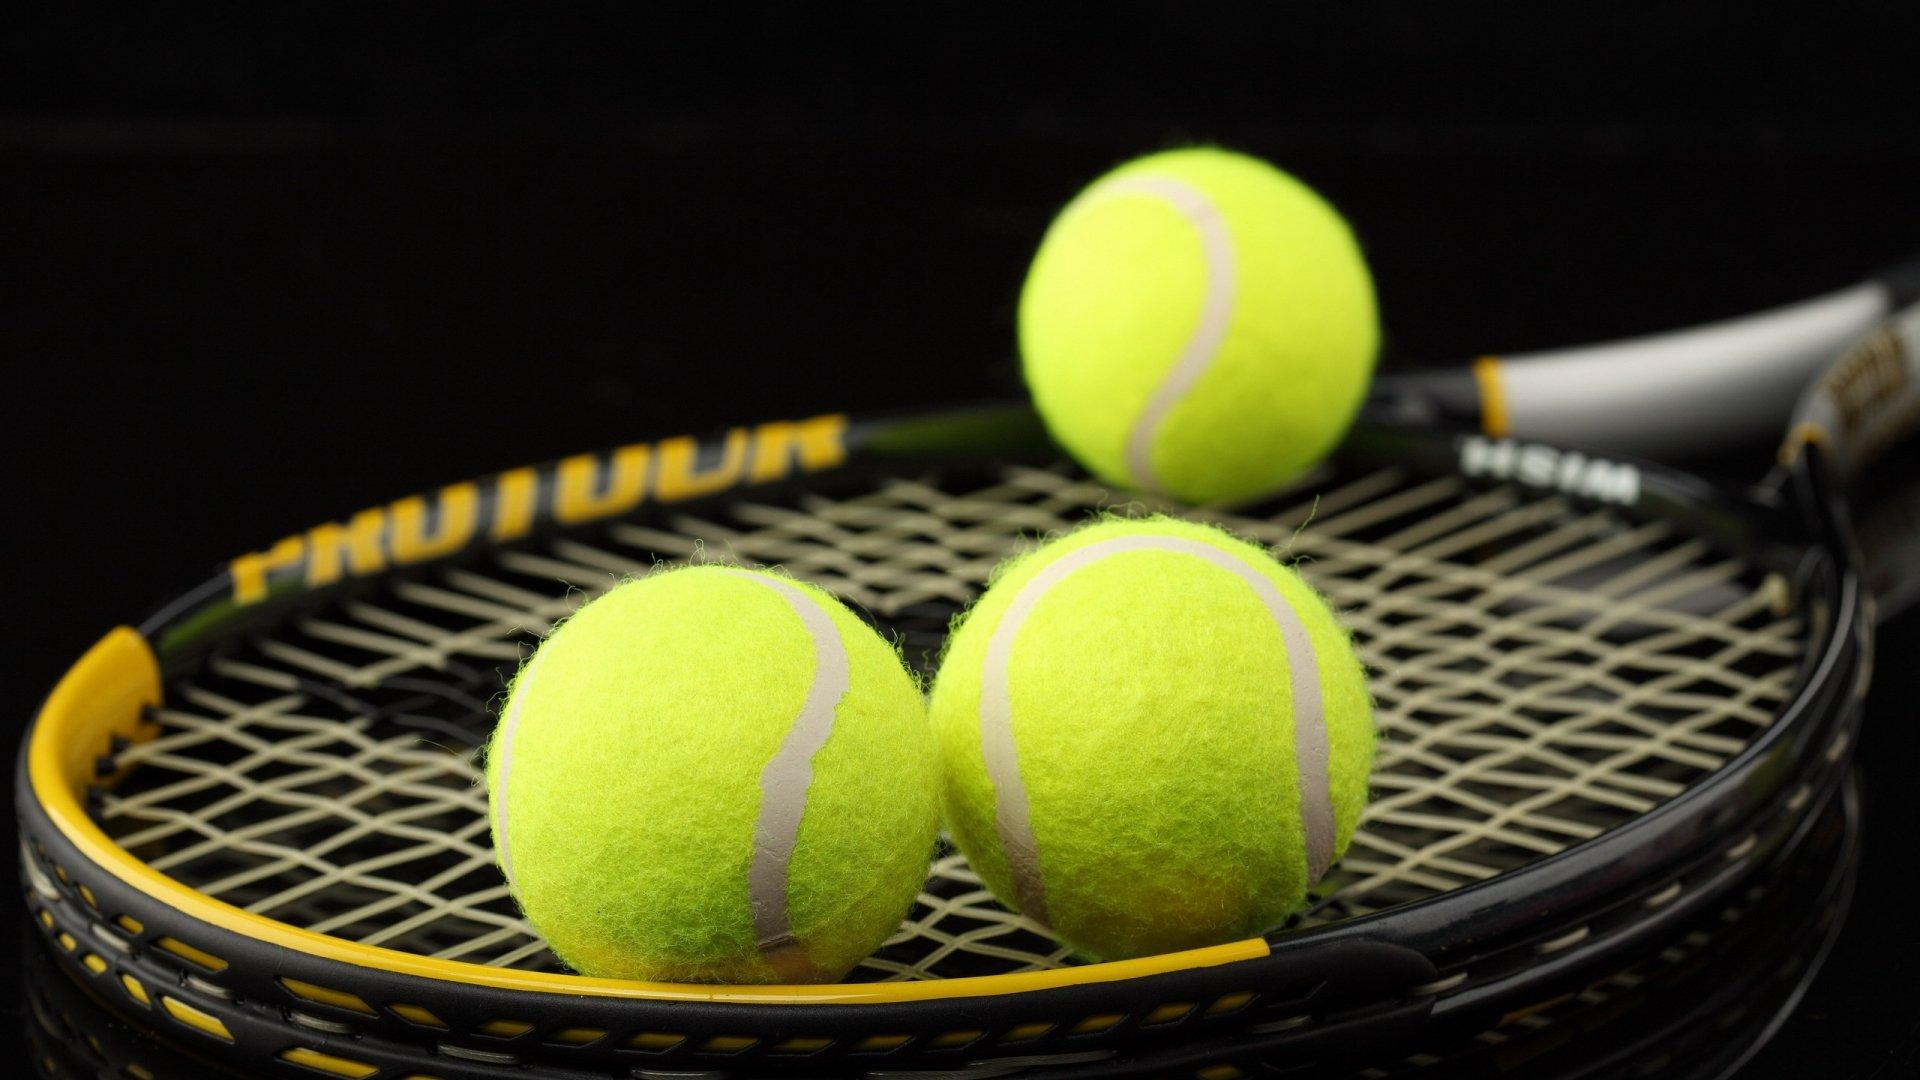 List of World's Top Ten Highest Paid Tennis Players